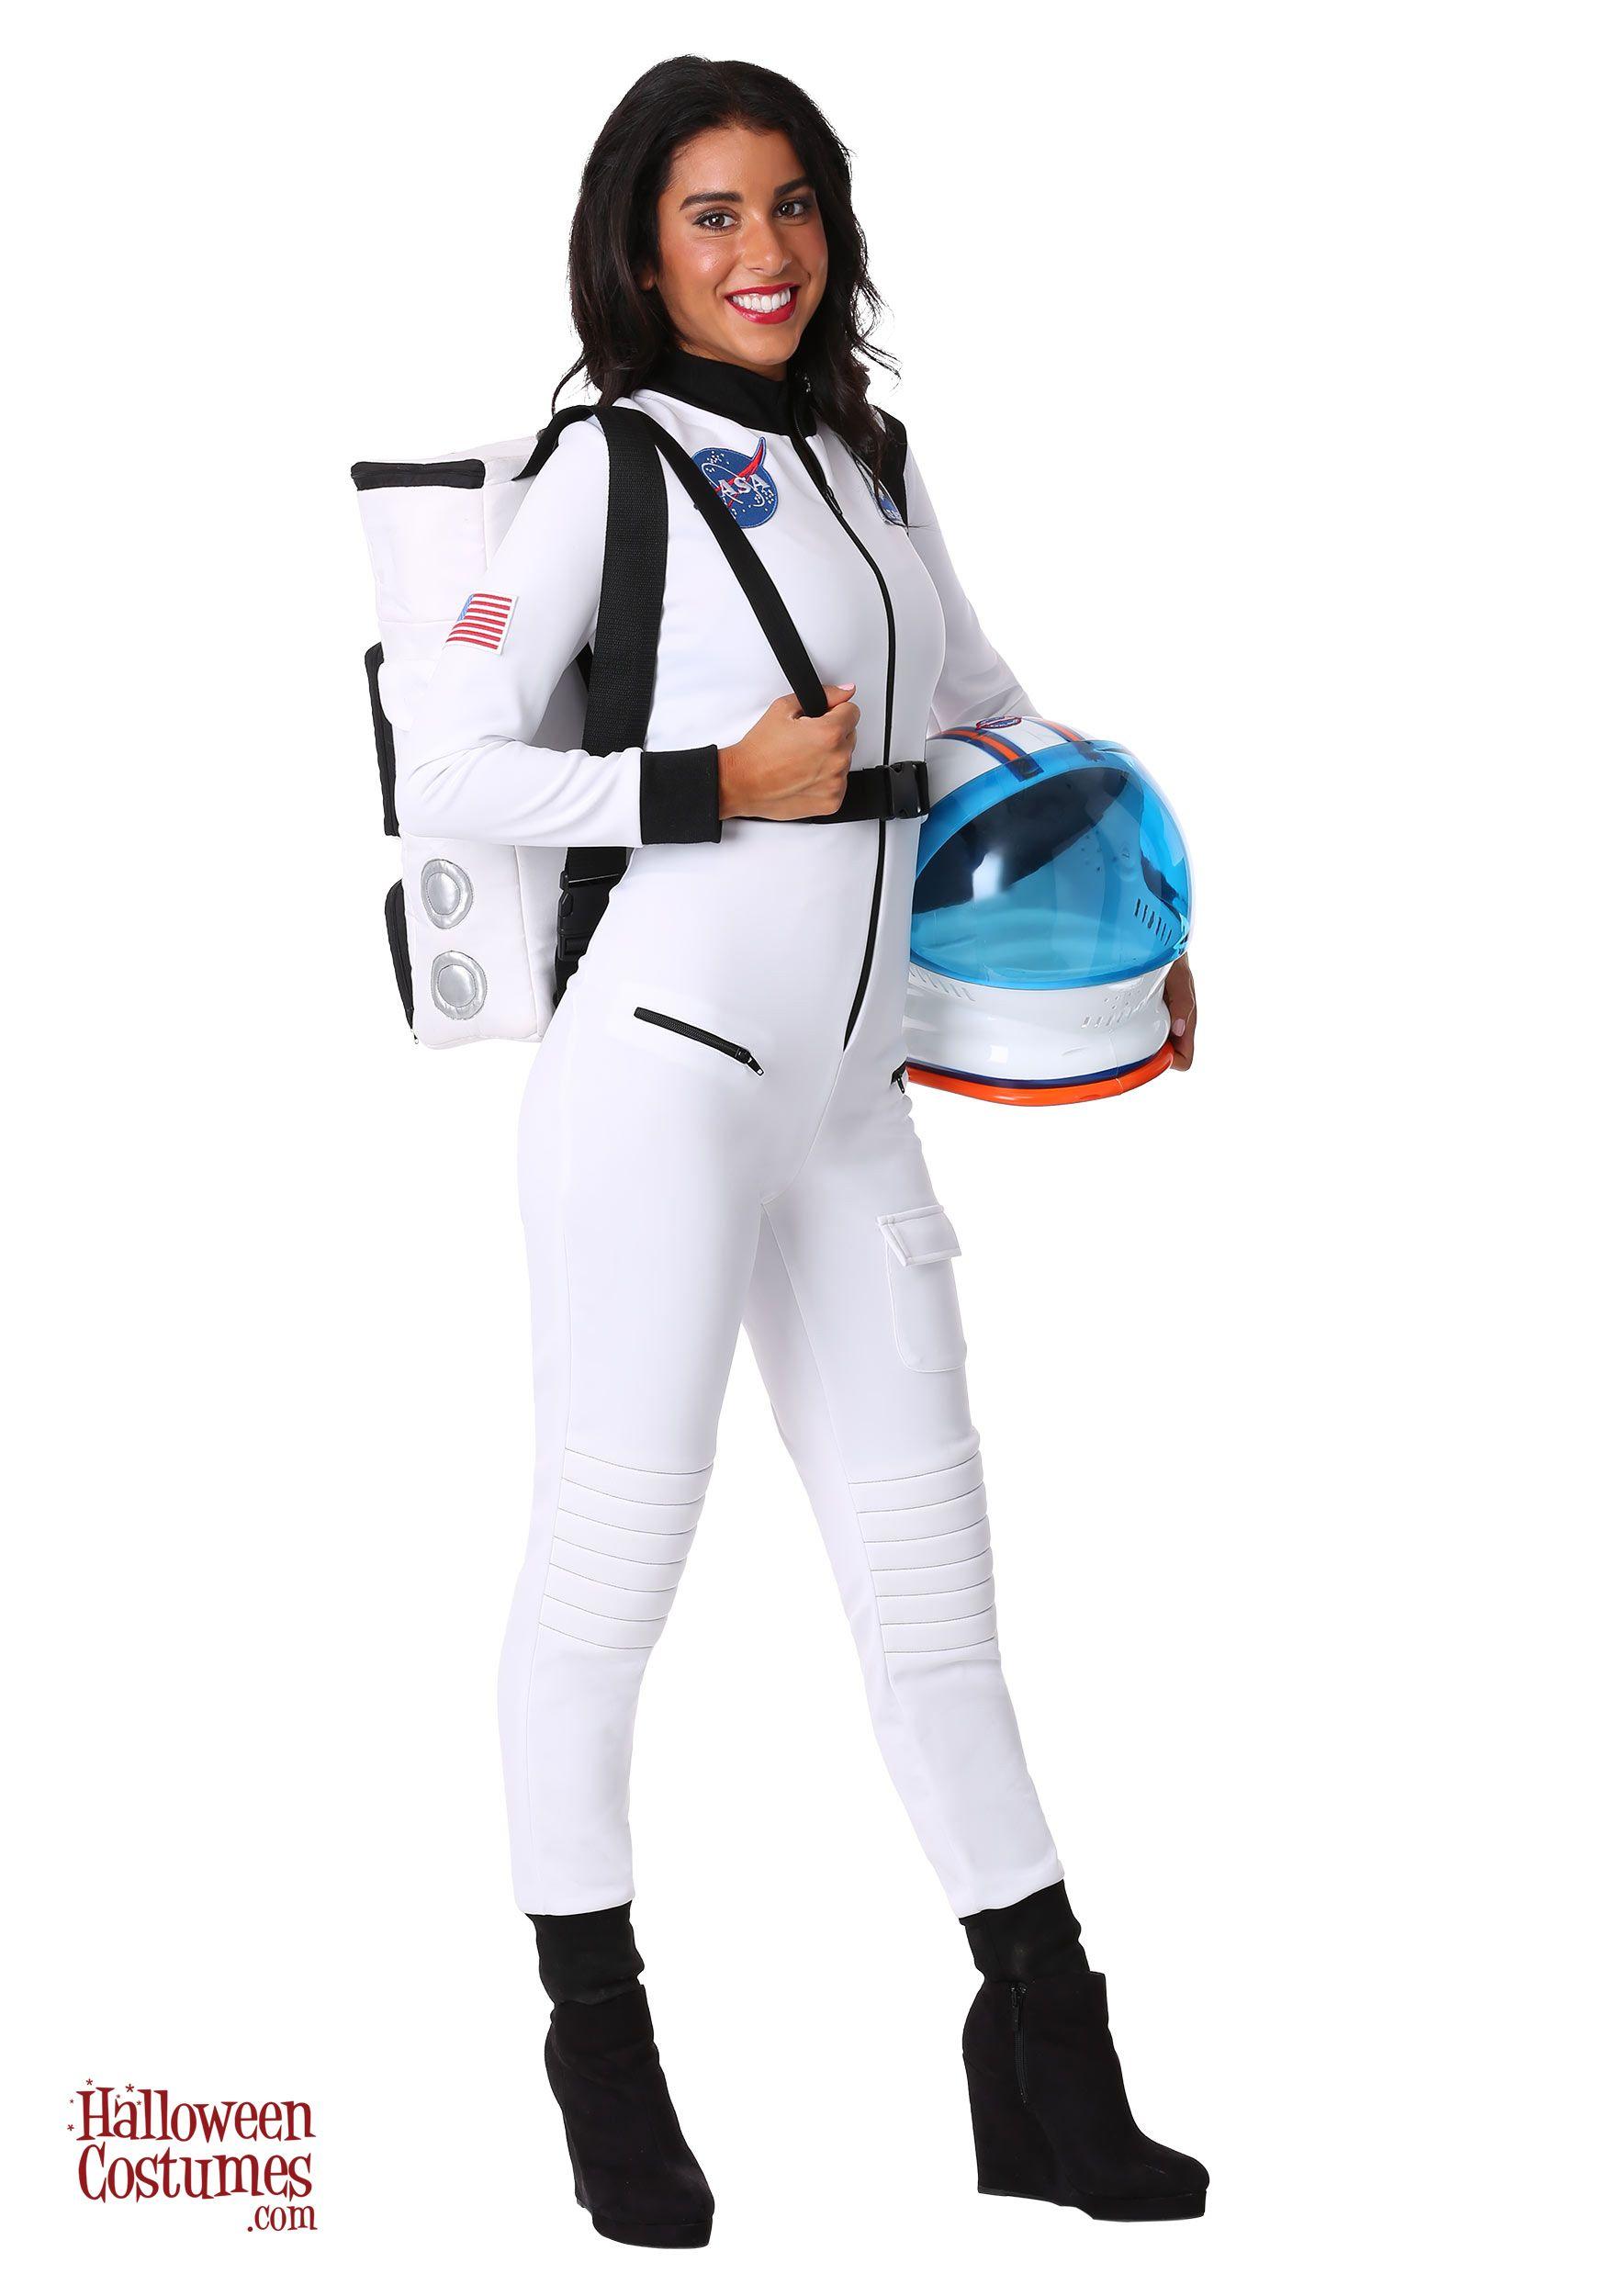 astronaut costume women - HD1750×2500